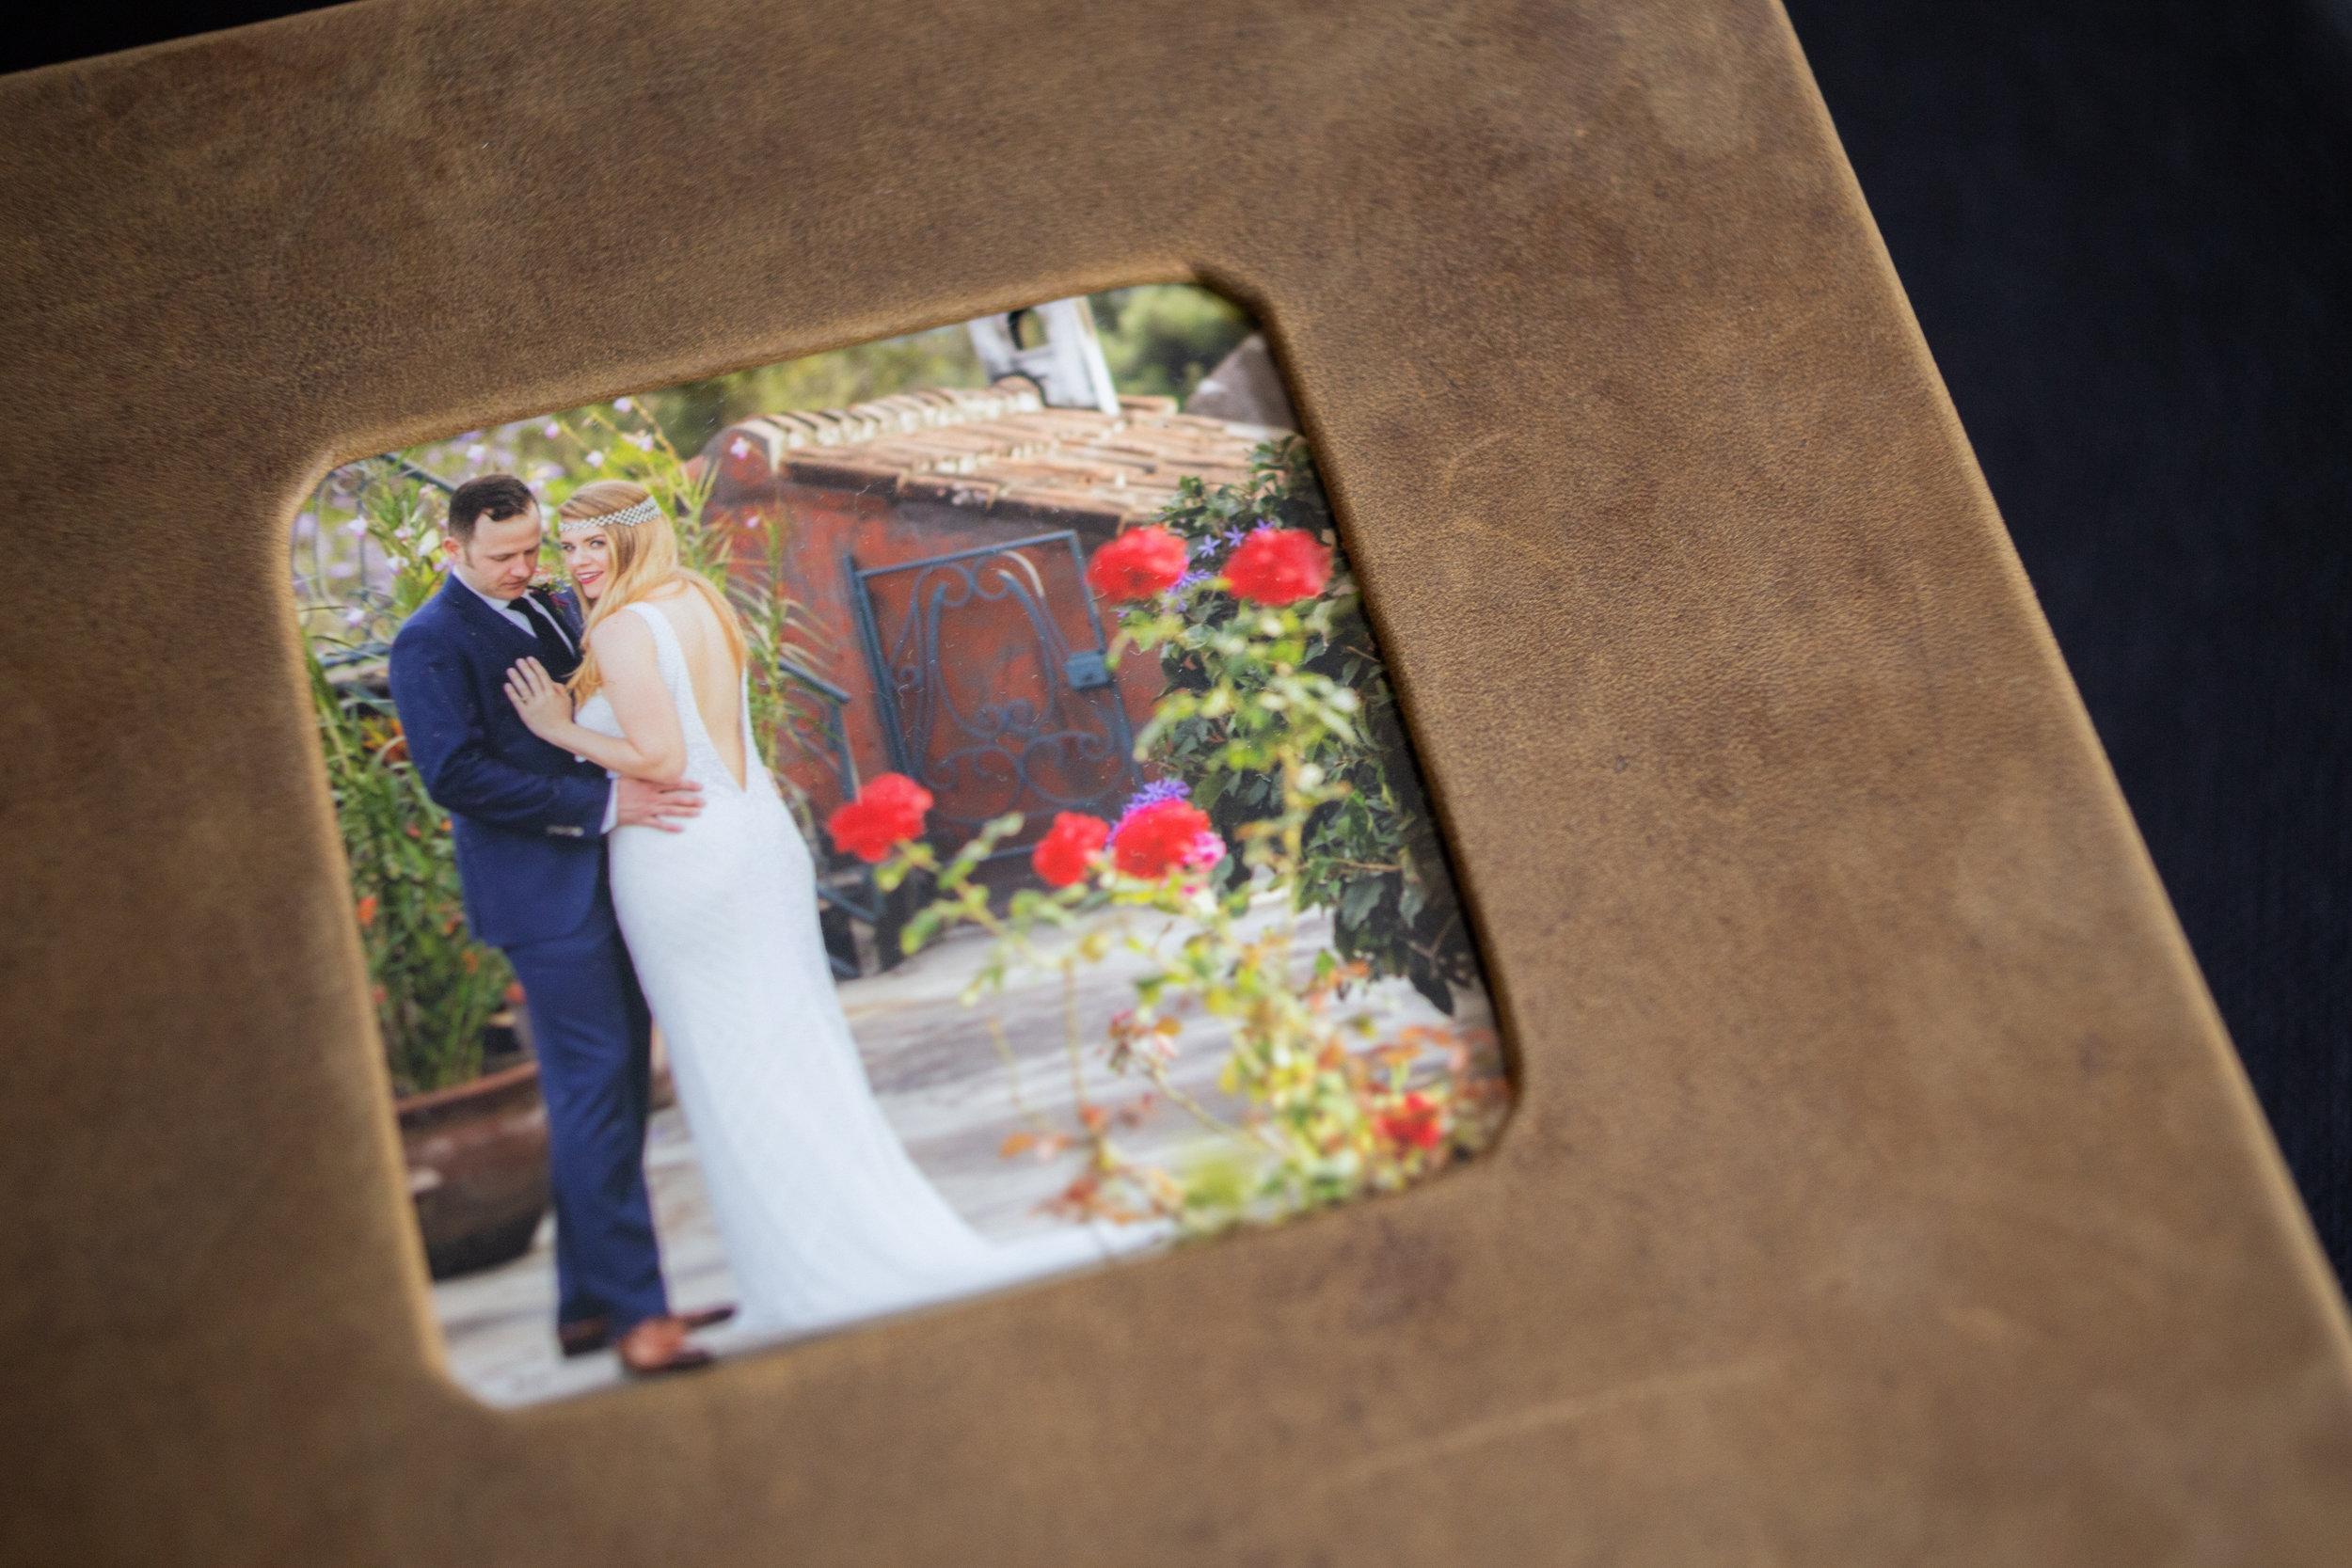 utah-wedding-photographer-album